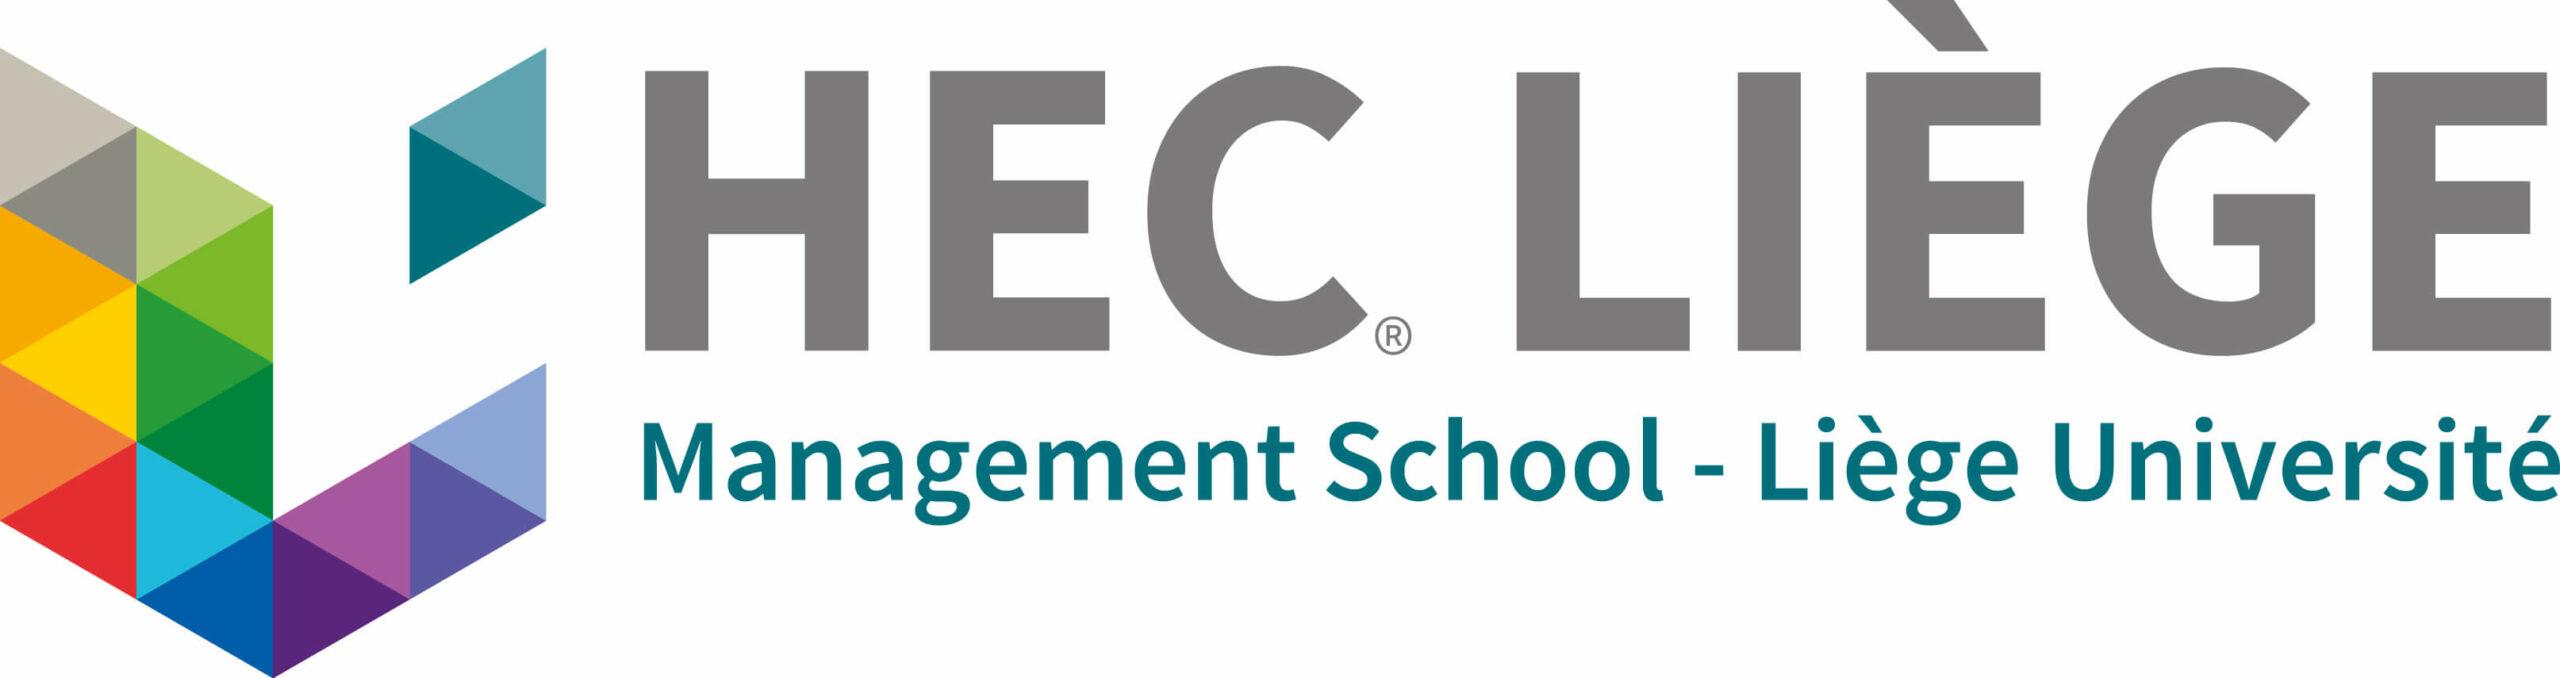 LOGO_HEC_LIEGE_MANAGEMENT_SCHOOL